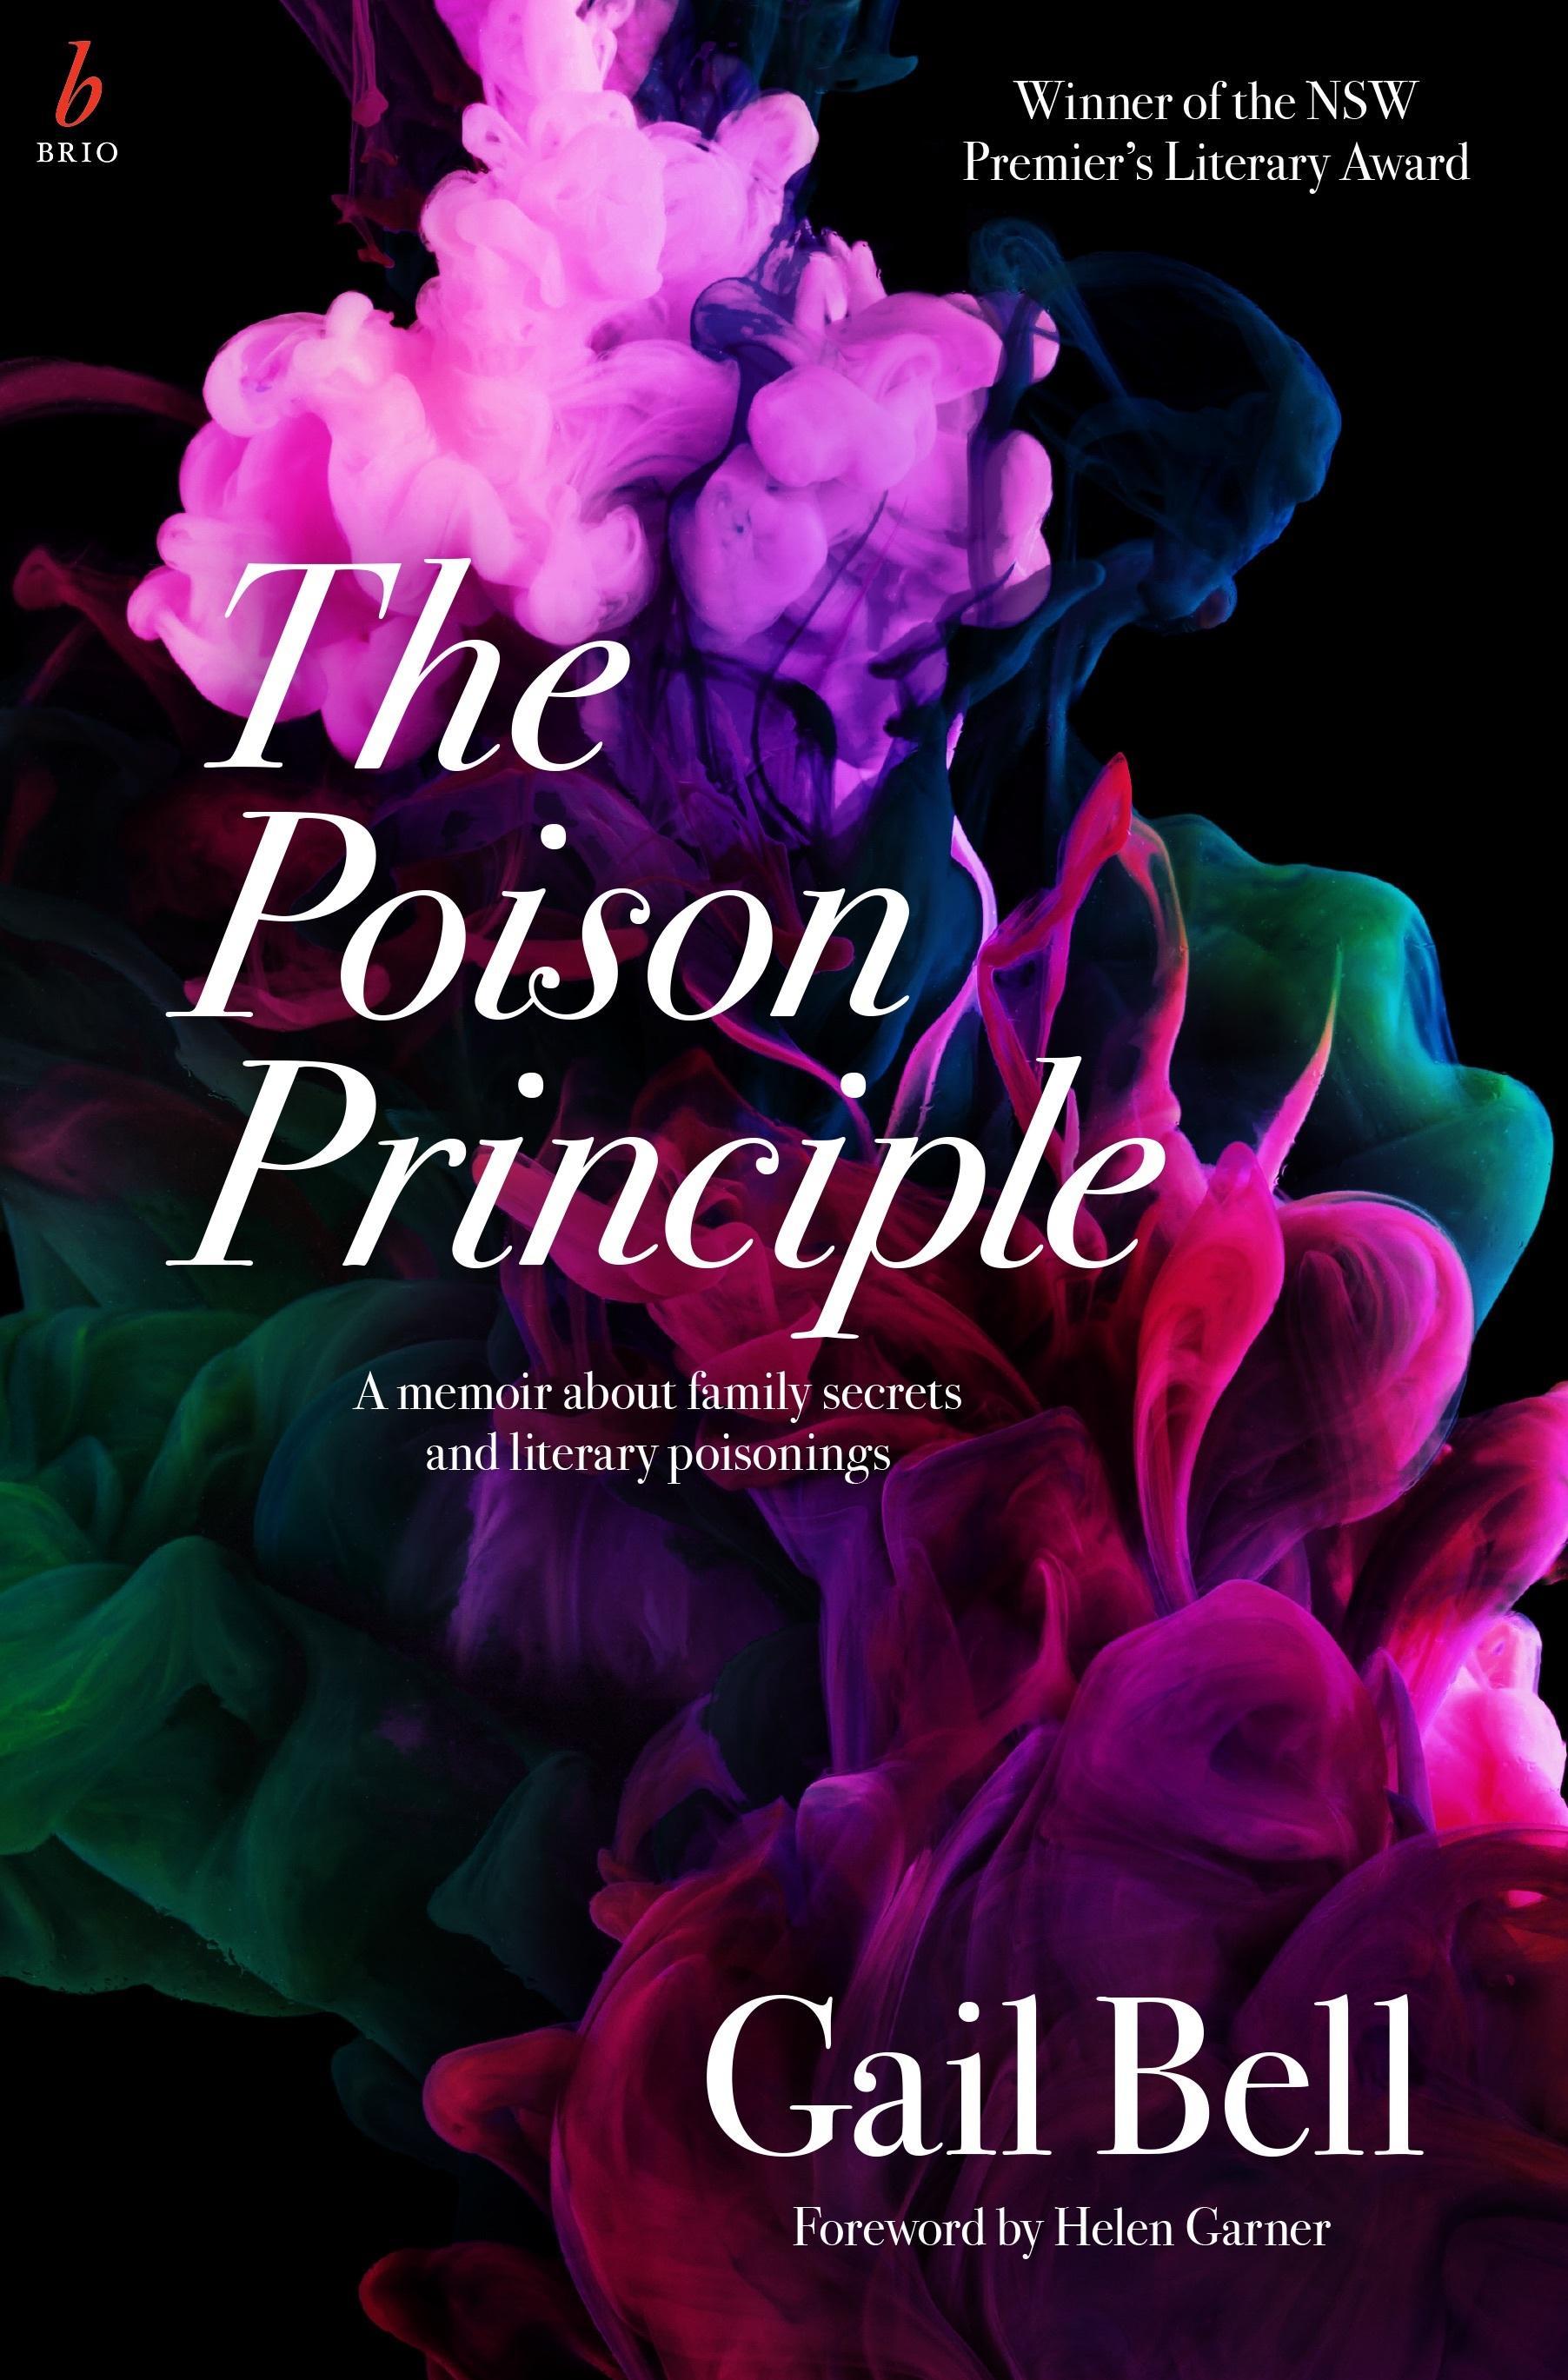 ThePoisonPrinciple